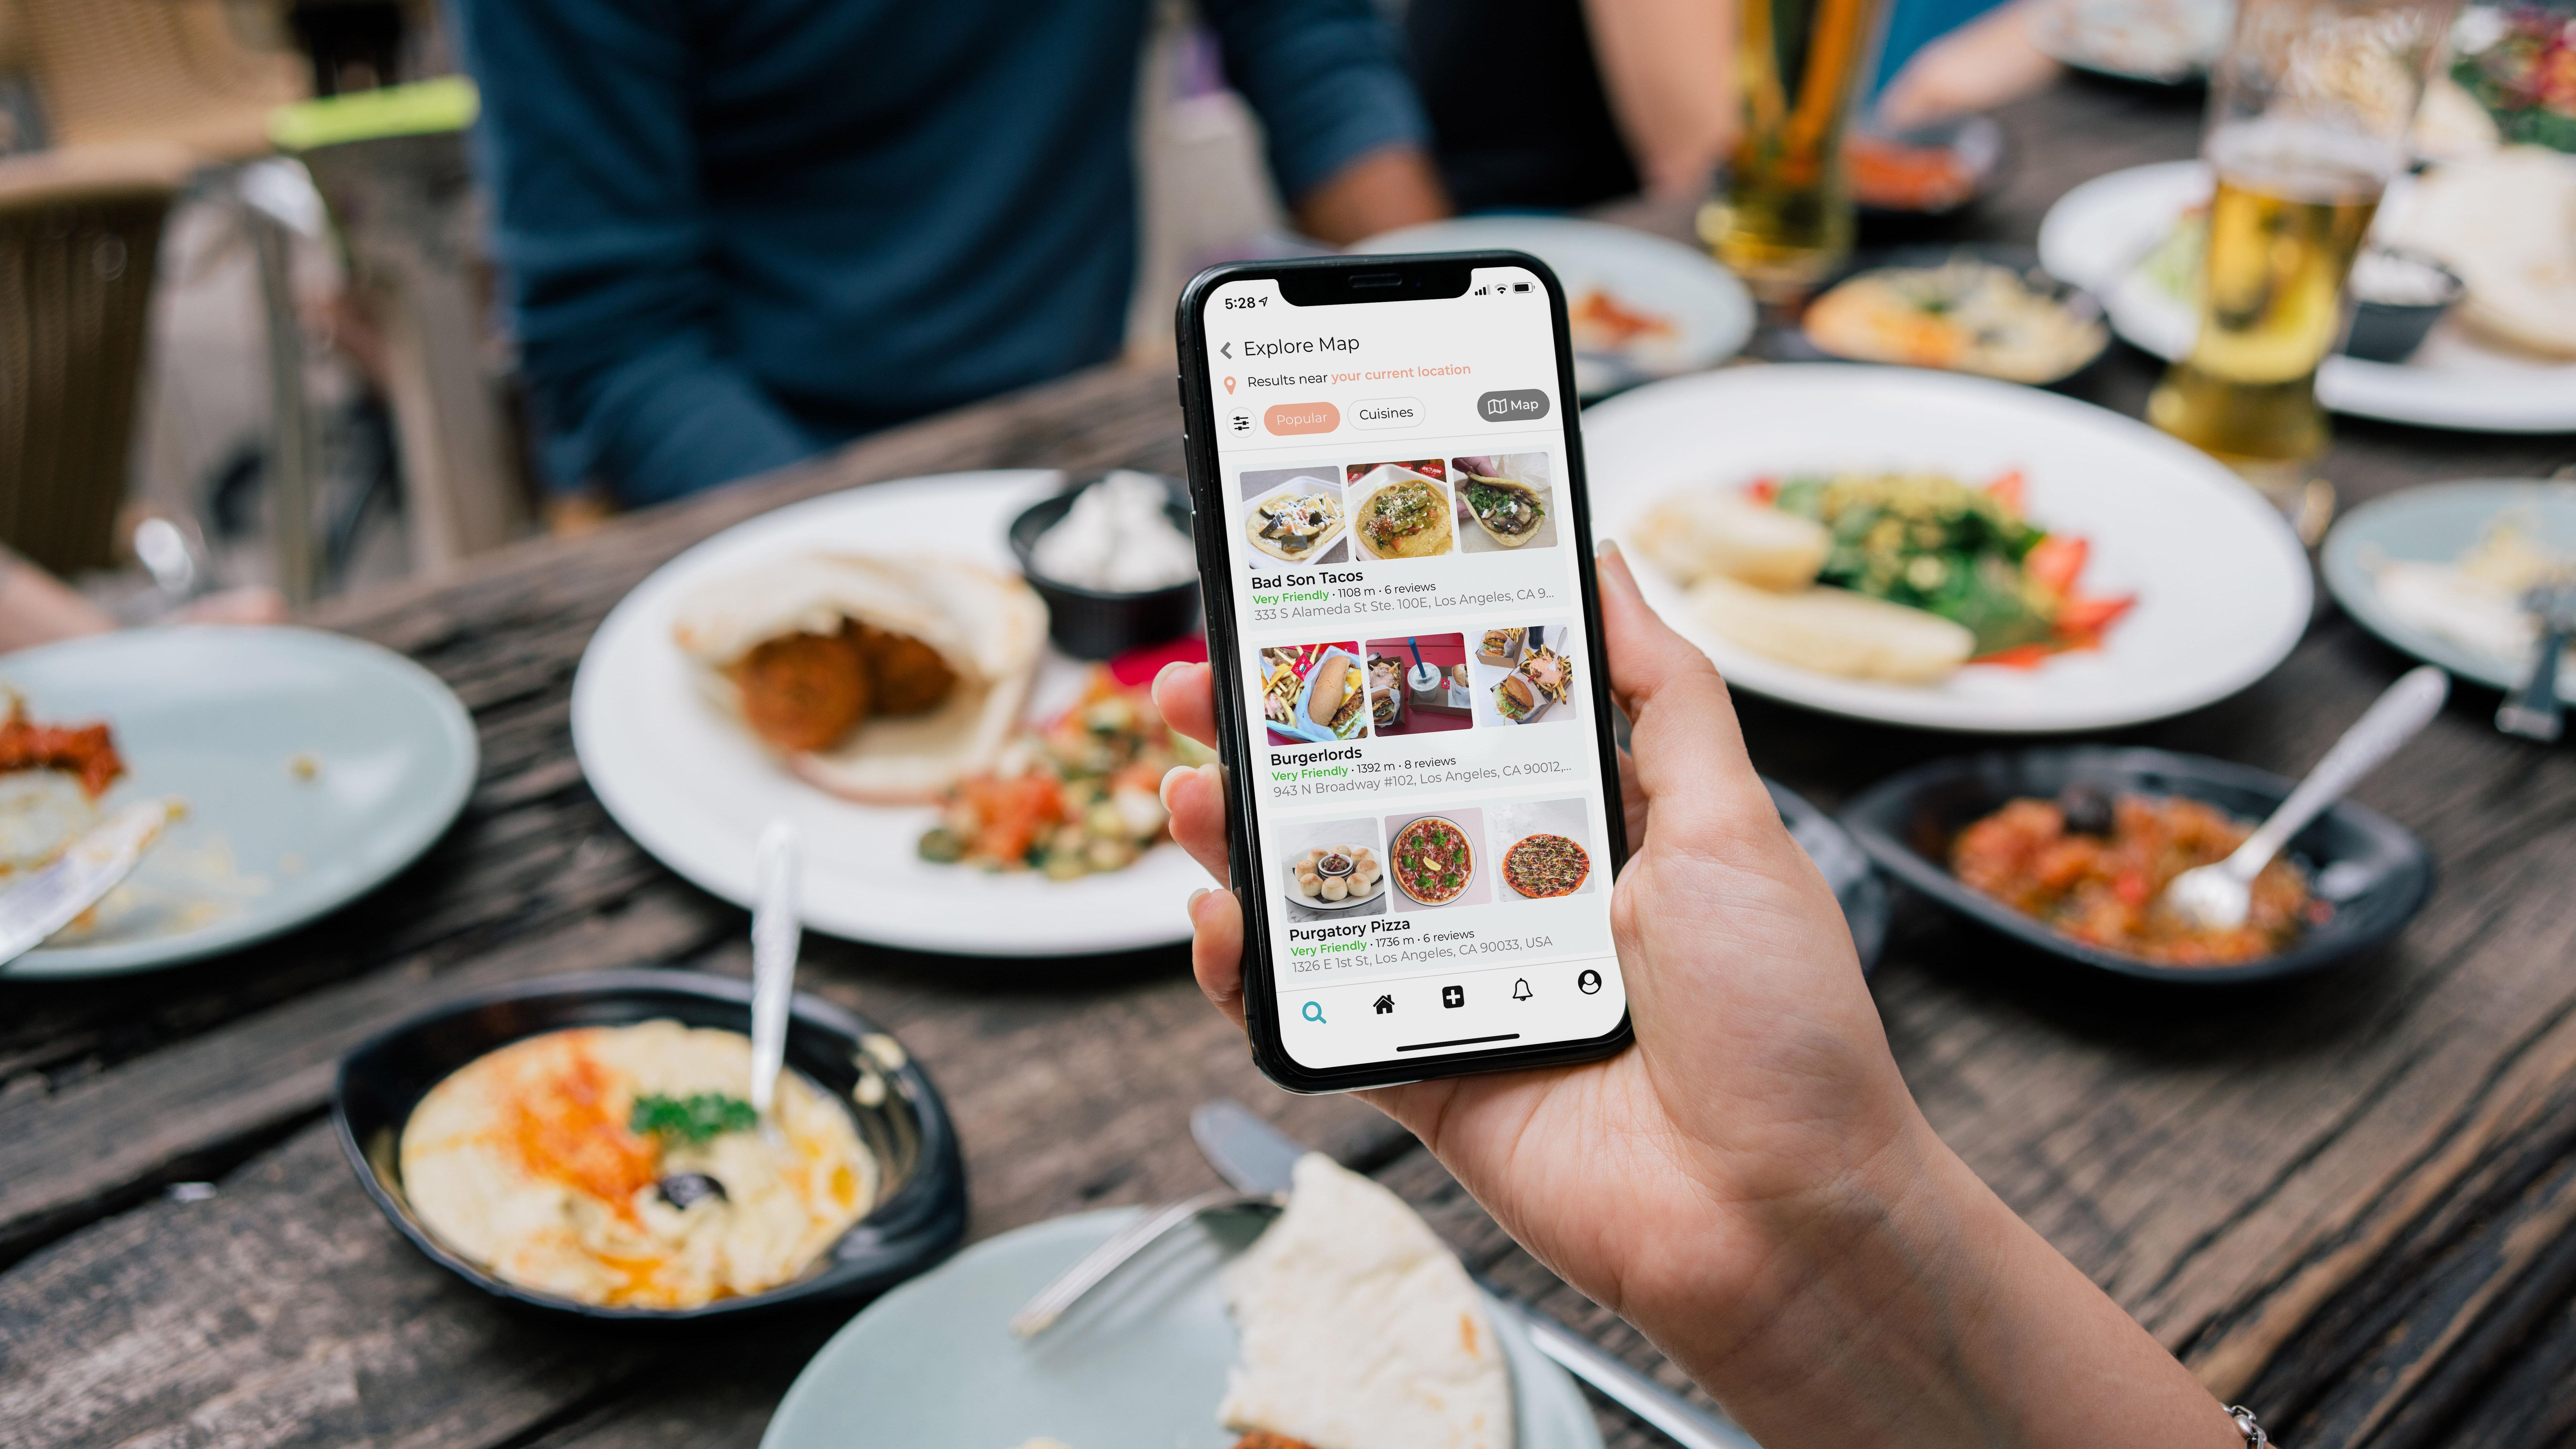 5 New Food Consumer Habits Transforming the Restaurant Industry